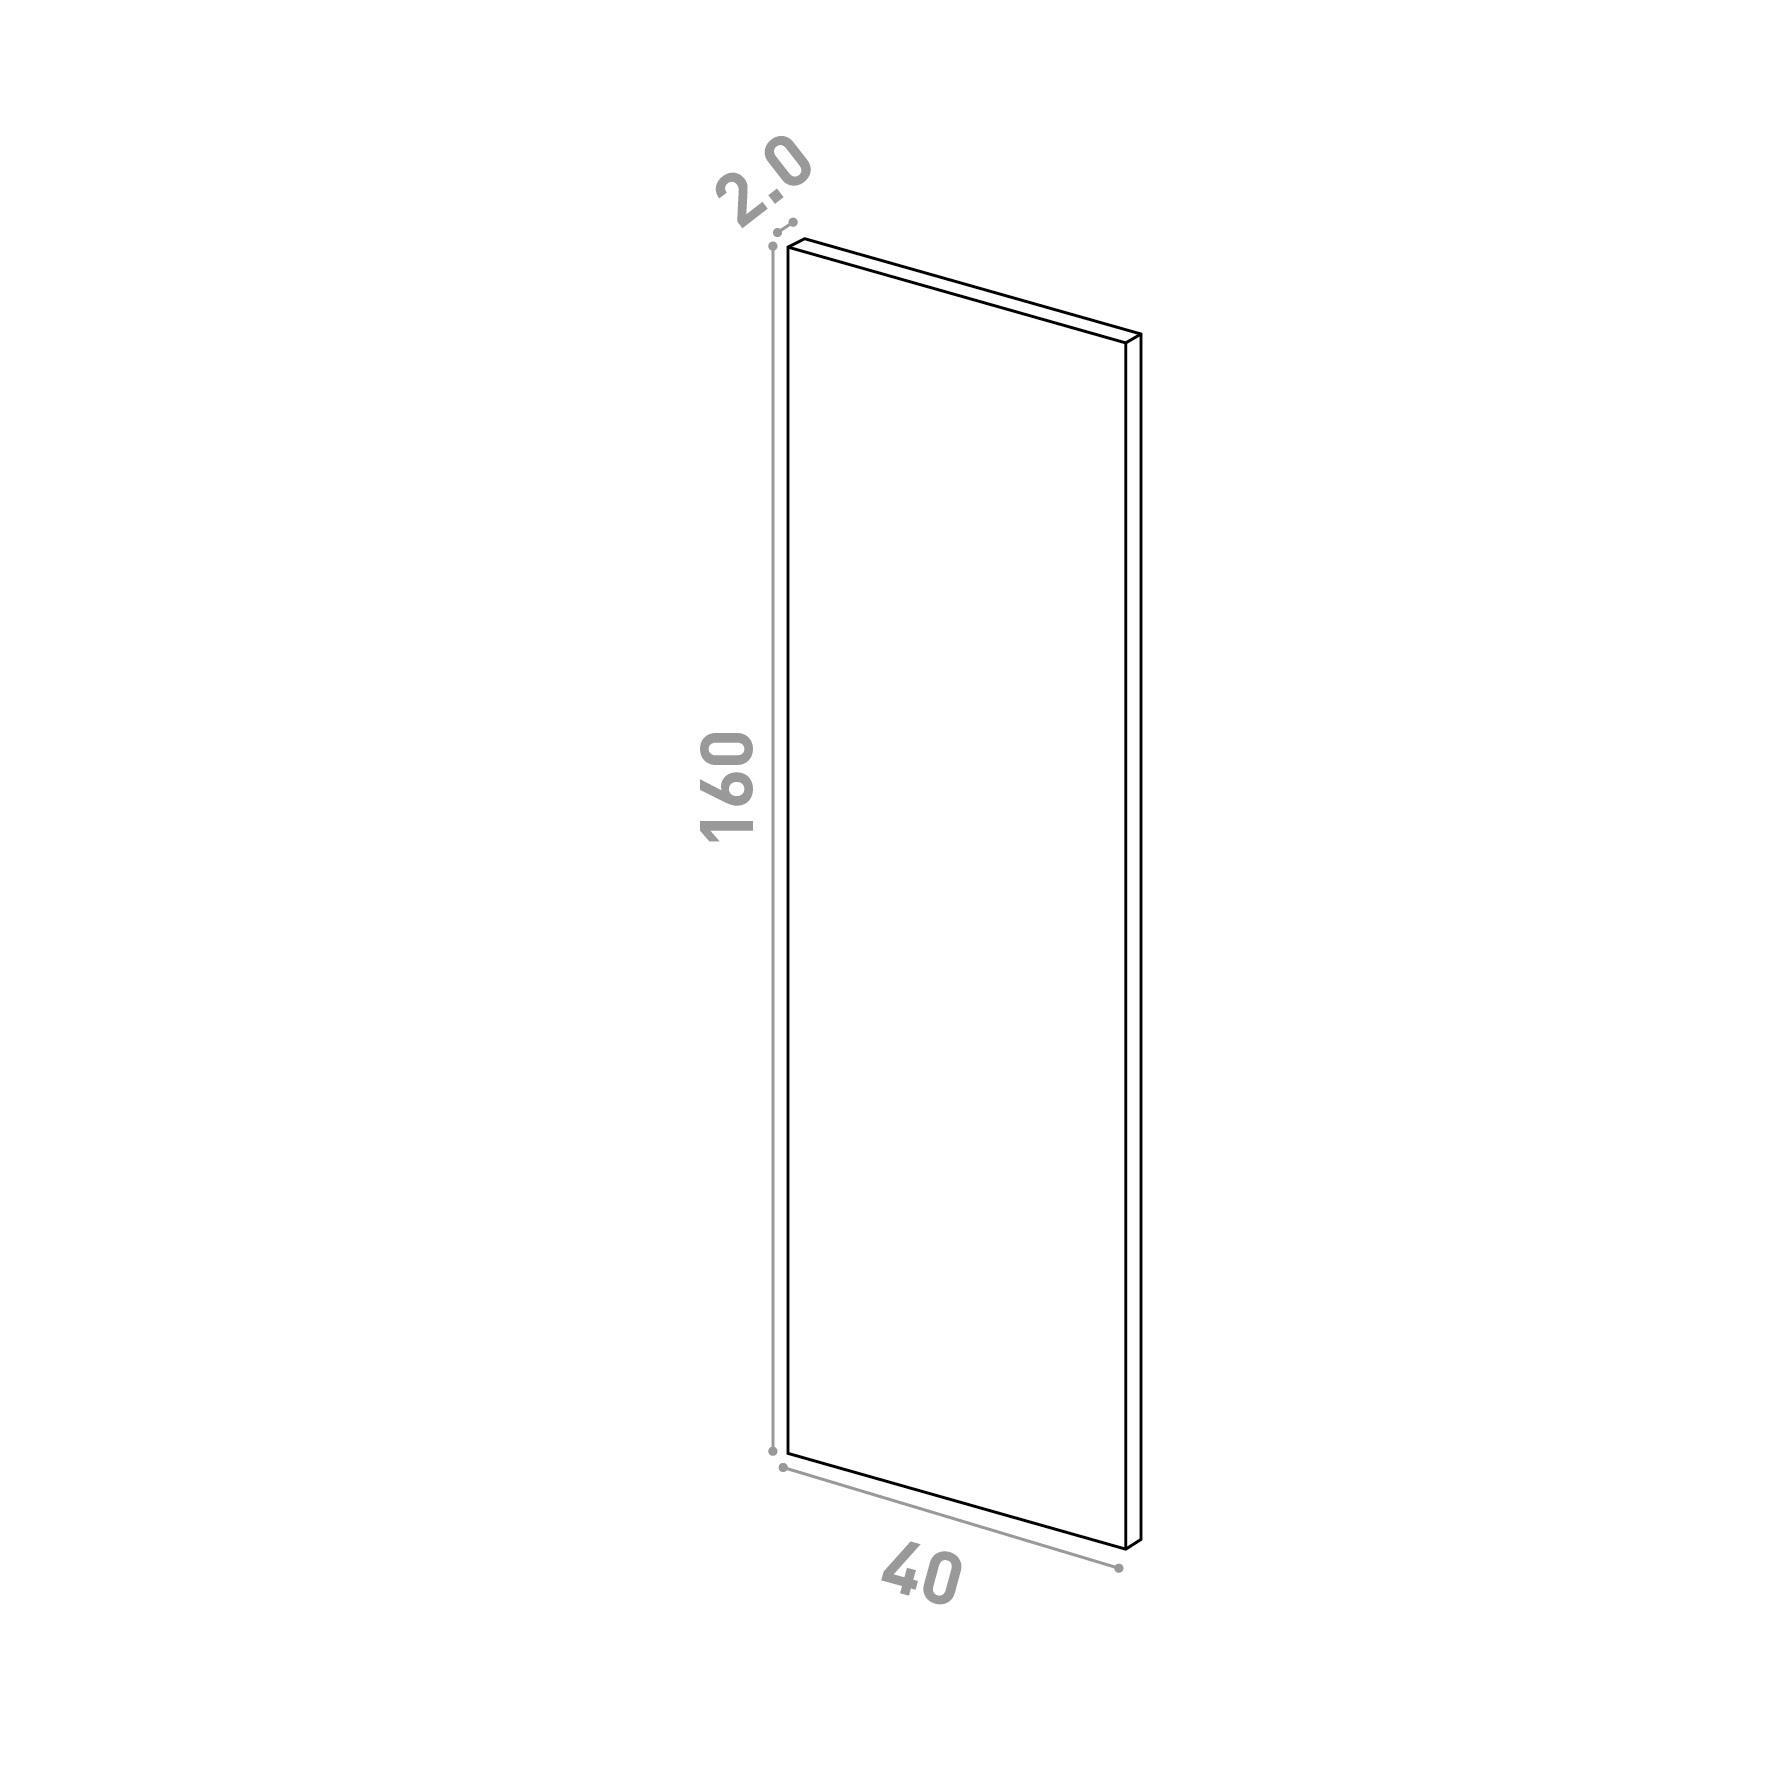 Porte 40x160cm   design lisse   chêne naturel